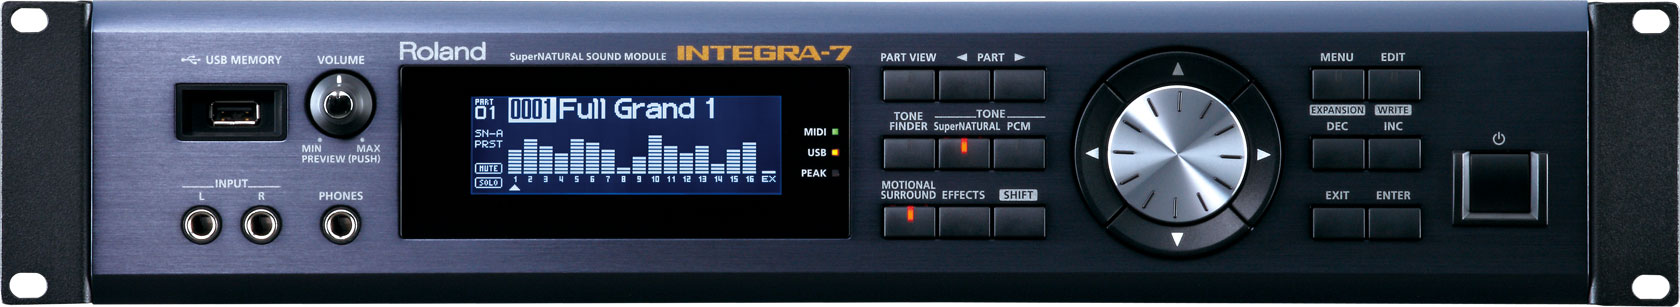 INTEGRA-7